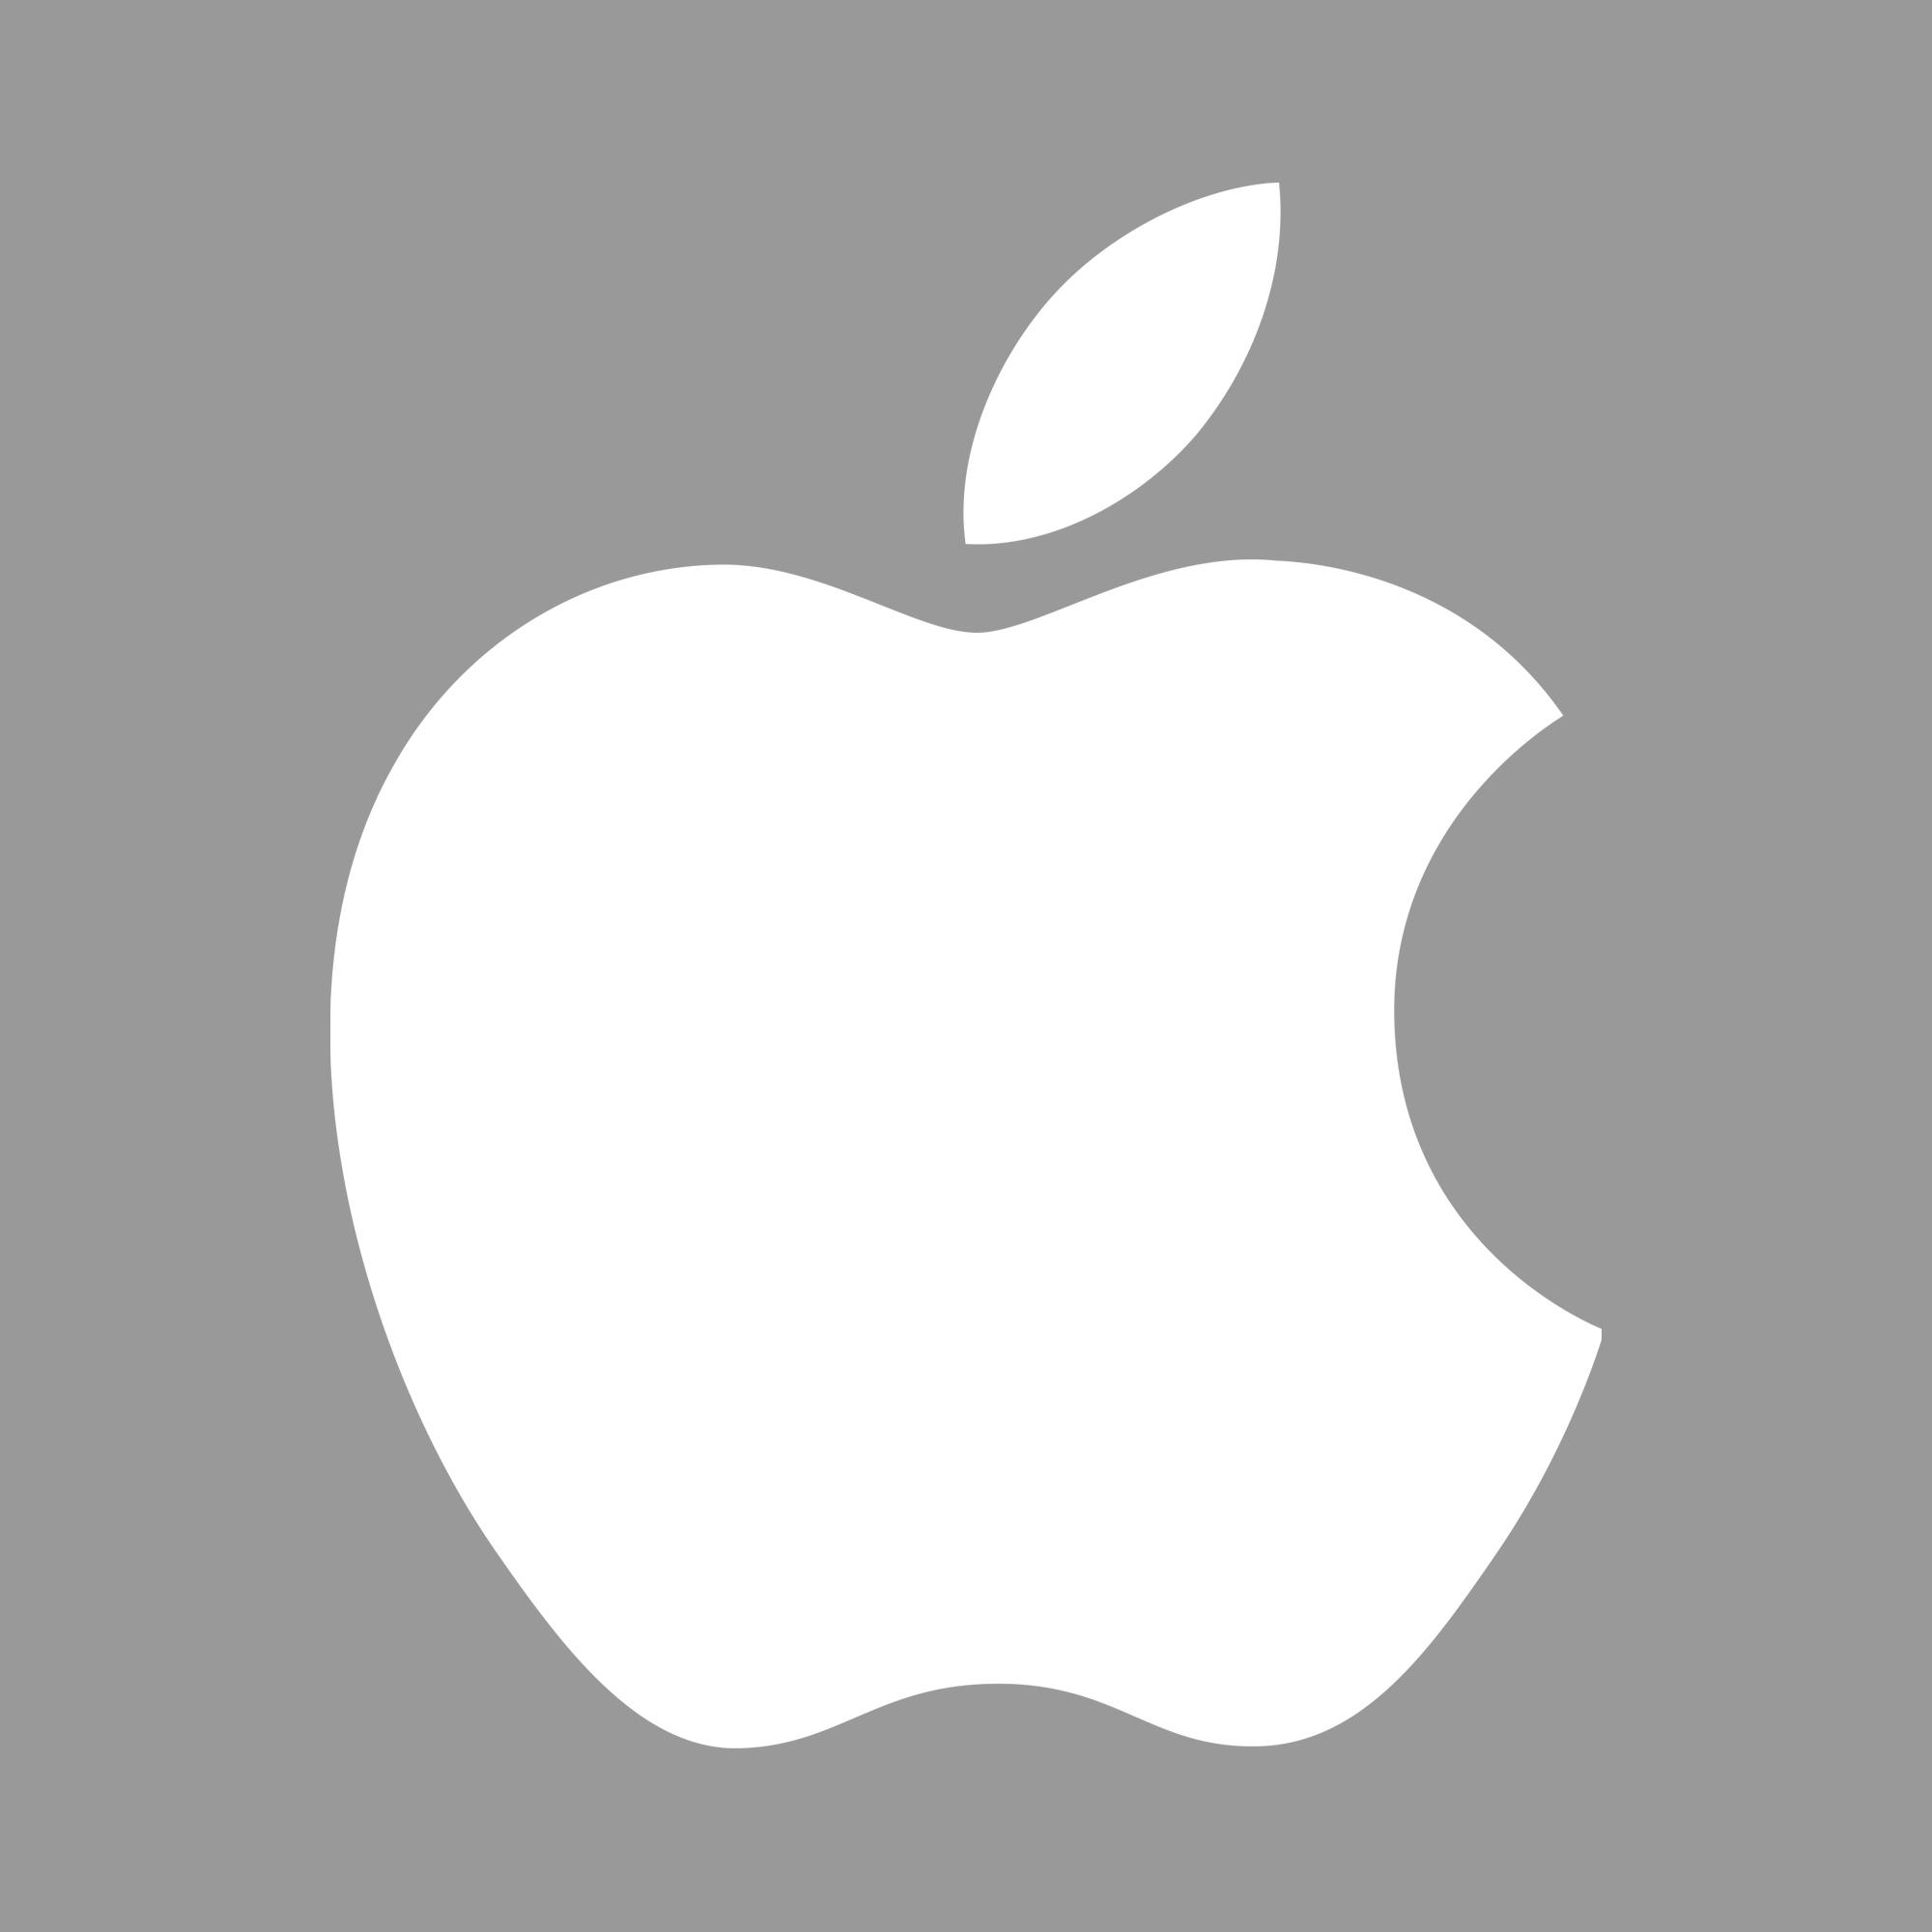 Logo: Apple